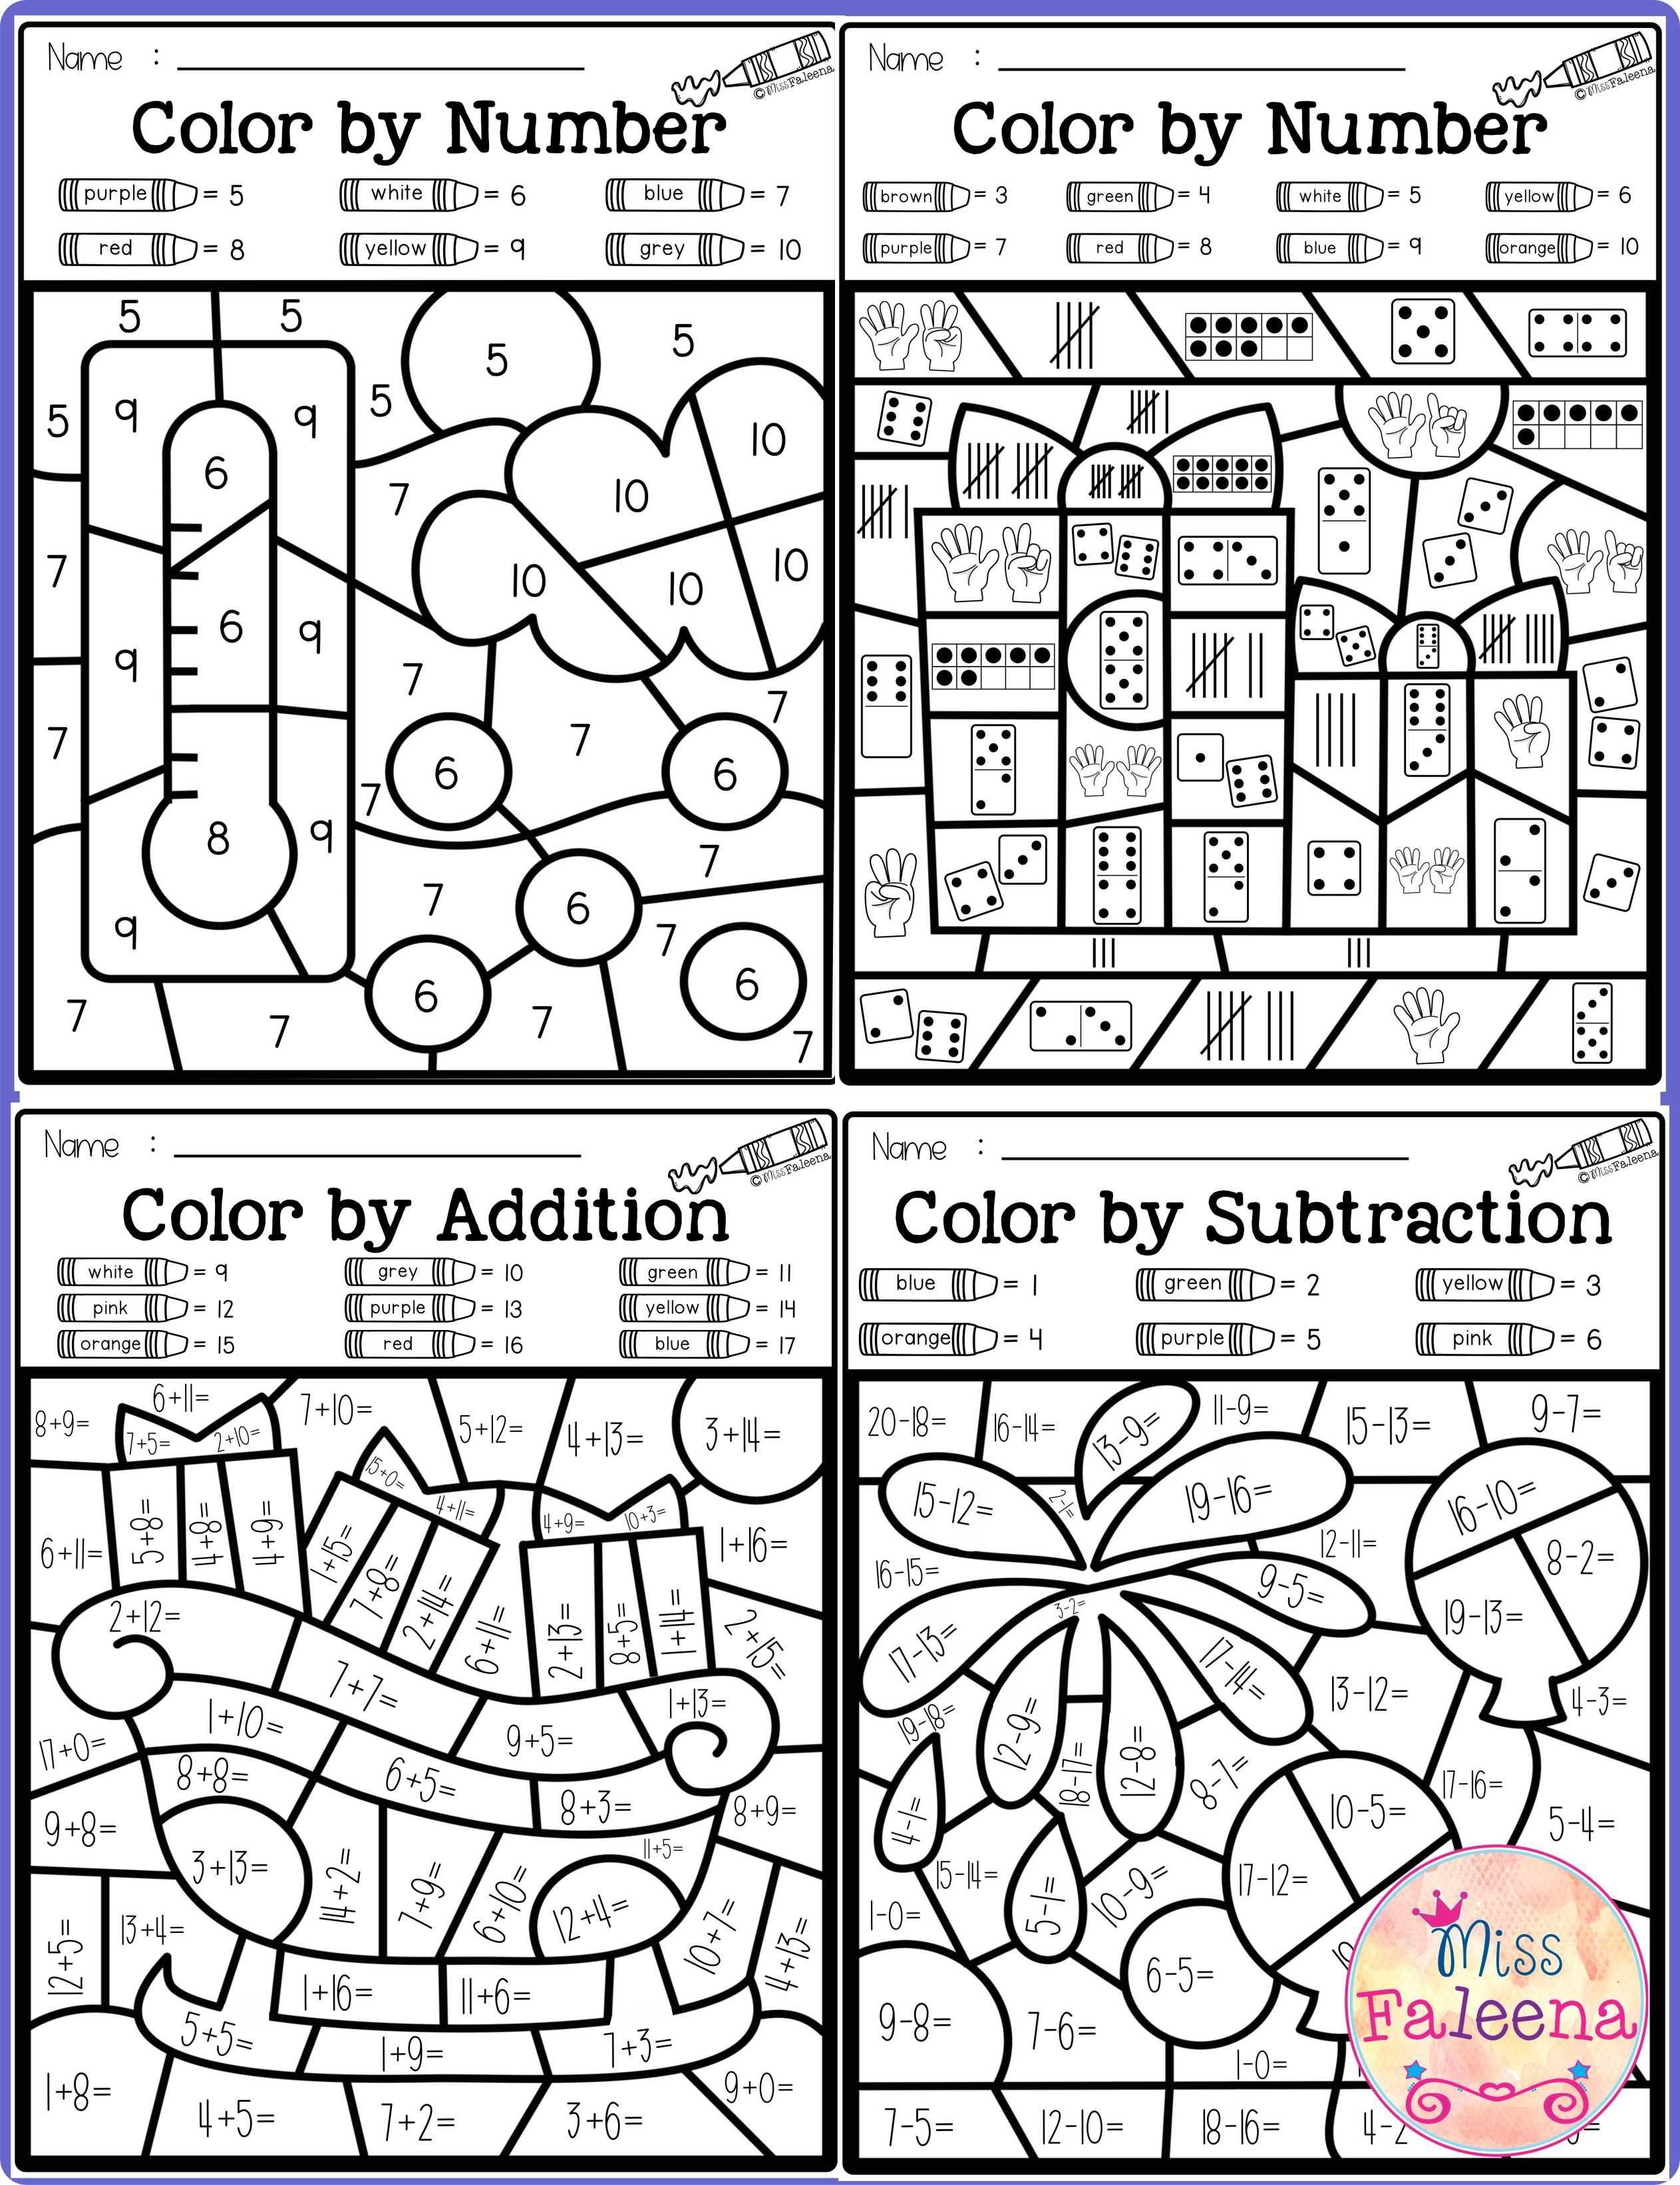 Color By Number Subtraction Worksheets - Cinebrique [ 3284 x 2525 Pixel ]